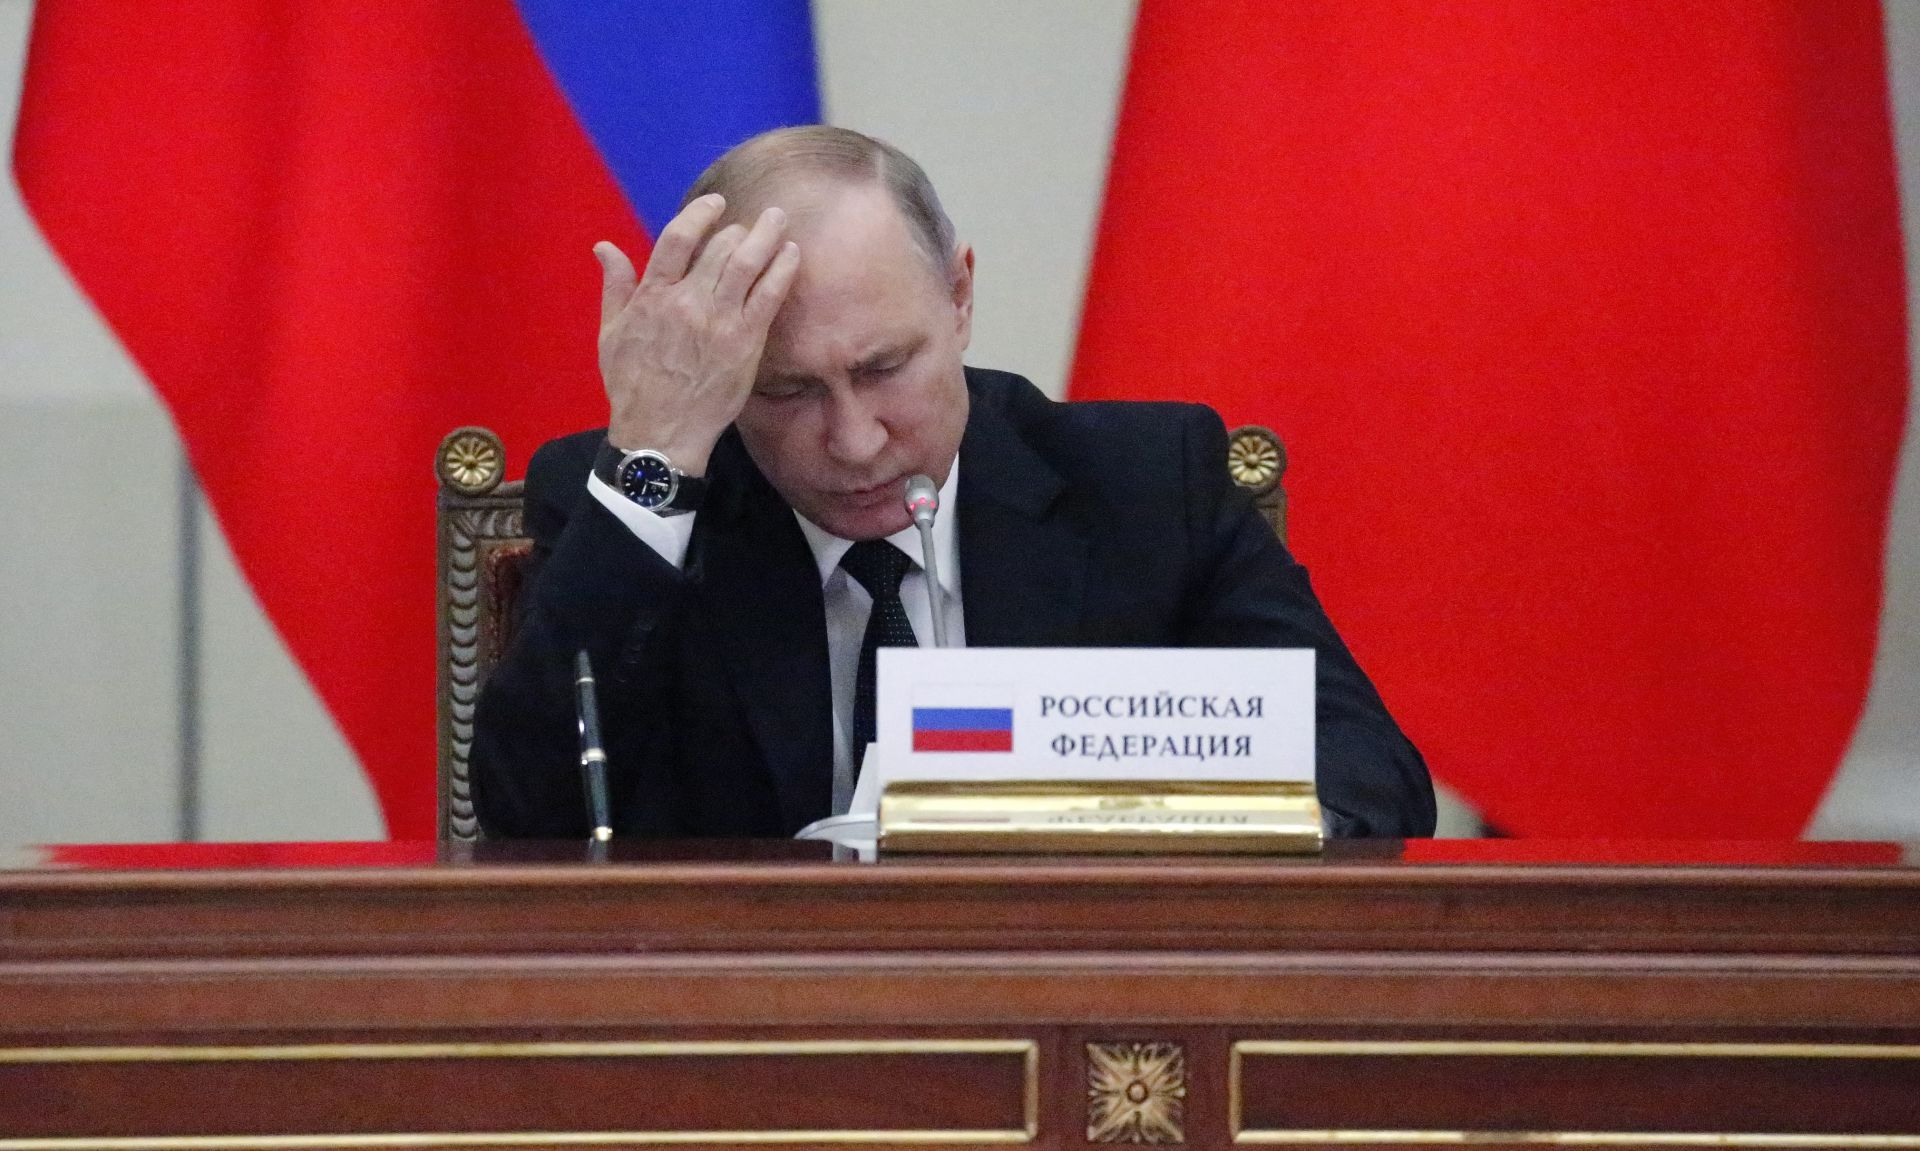 I Crna Gora protjerala ruskog diplomata